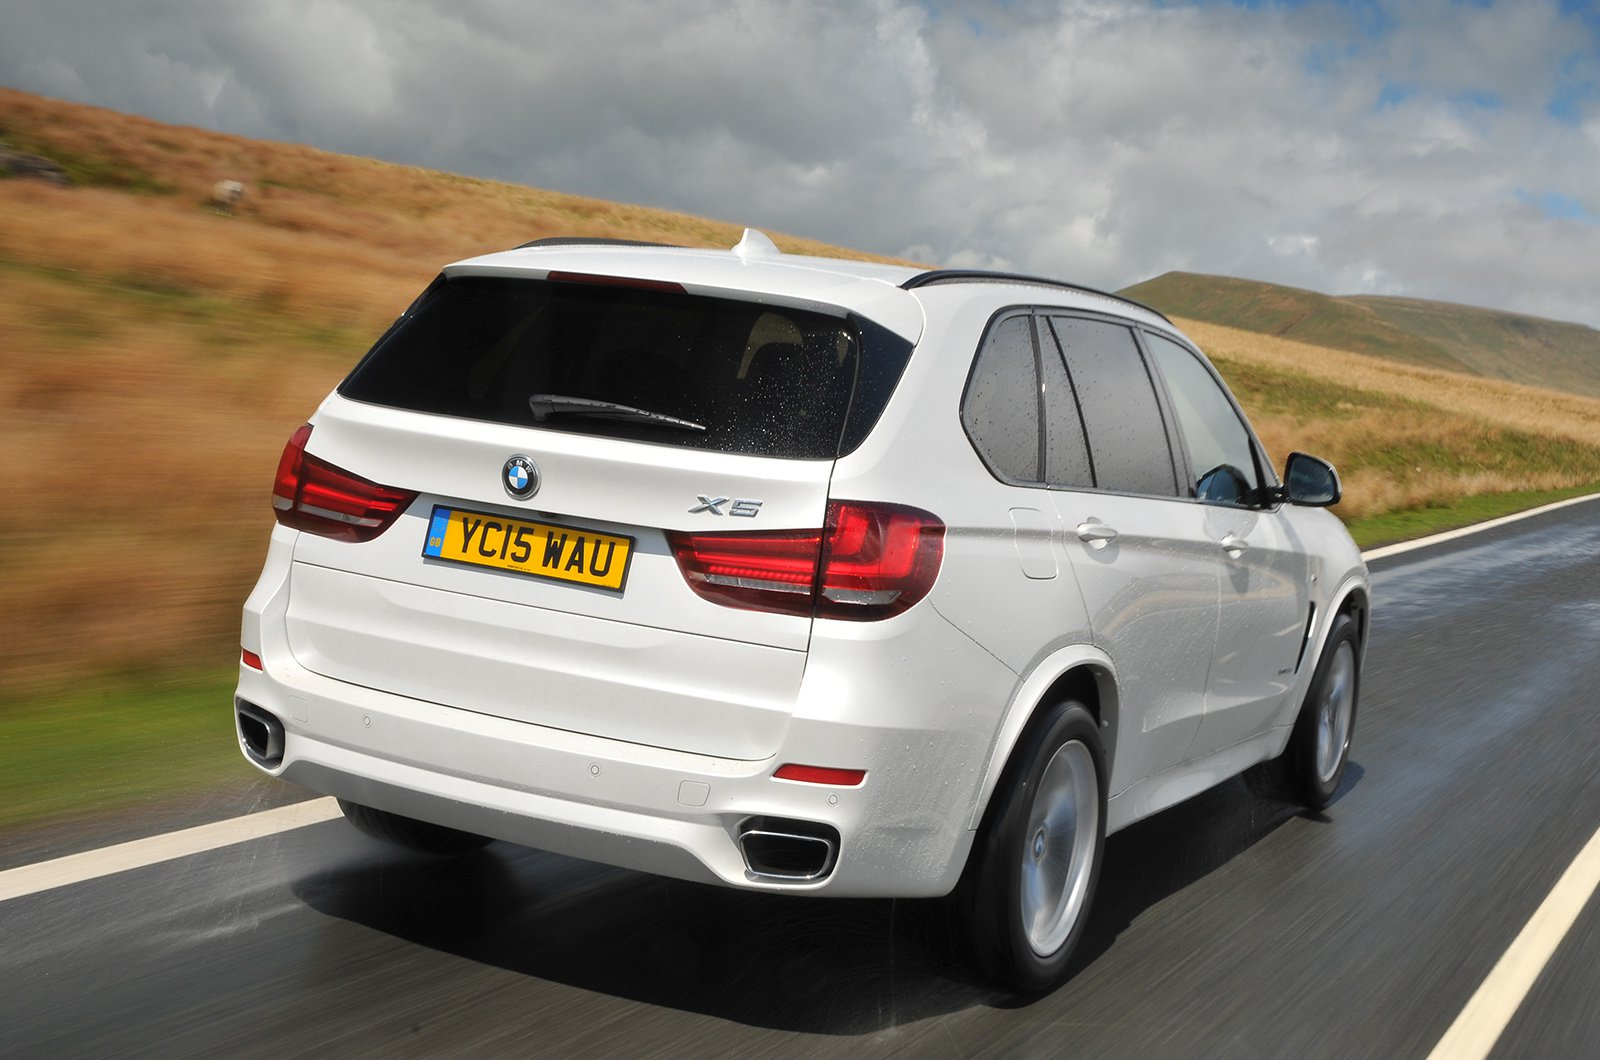 Used BMW X5 rear corner